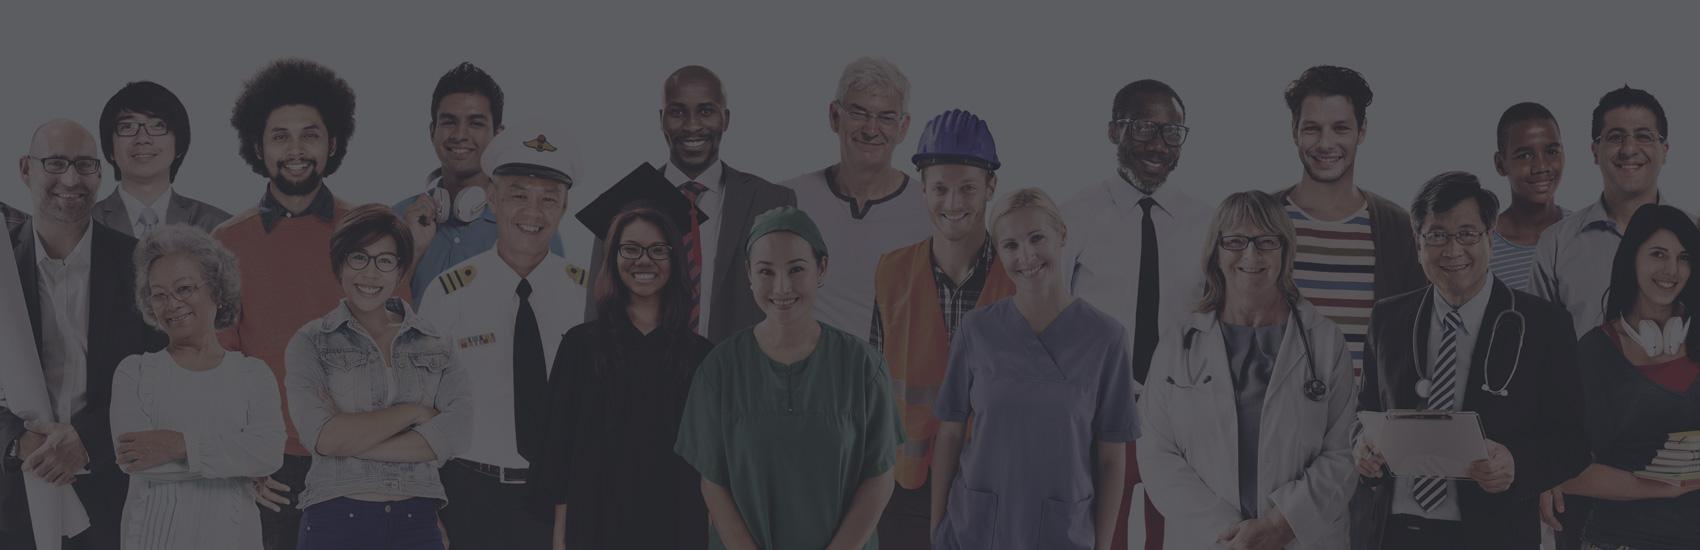 A program that facilitates hiring